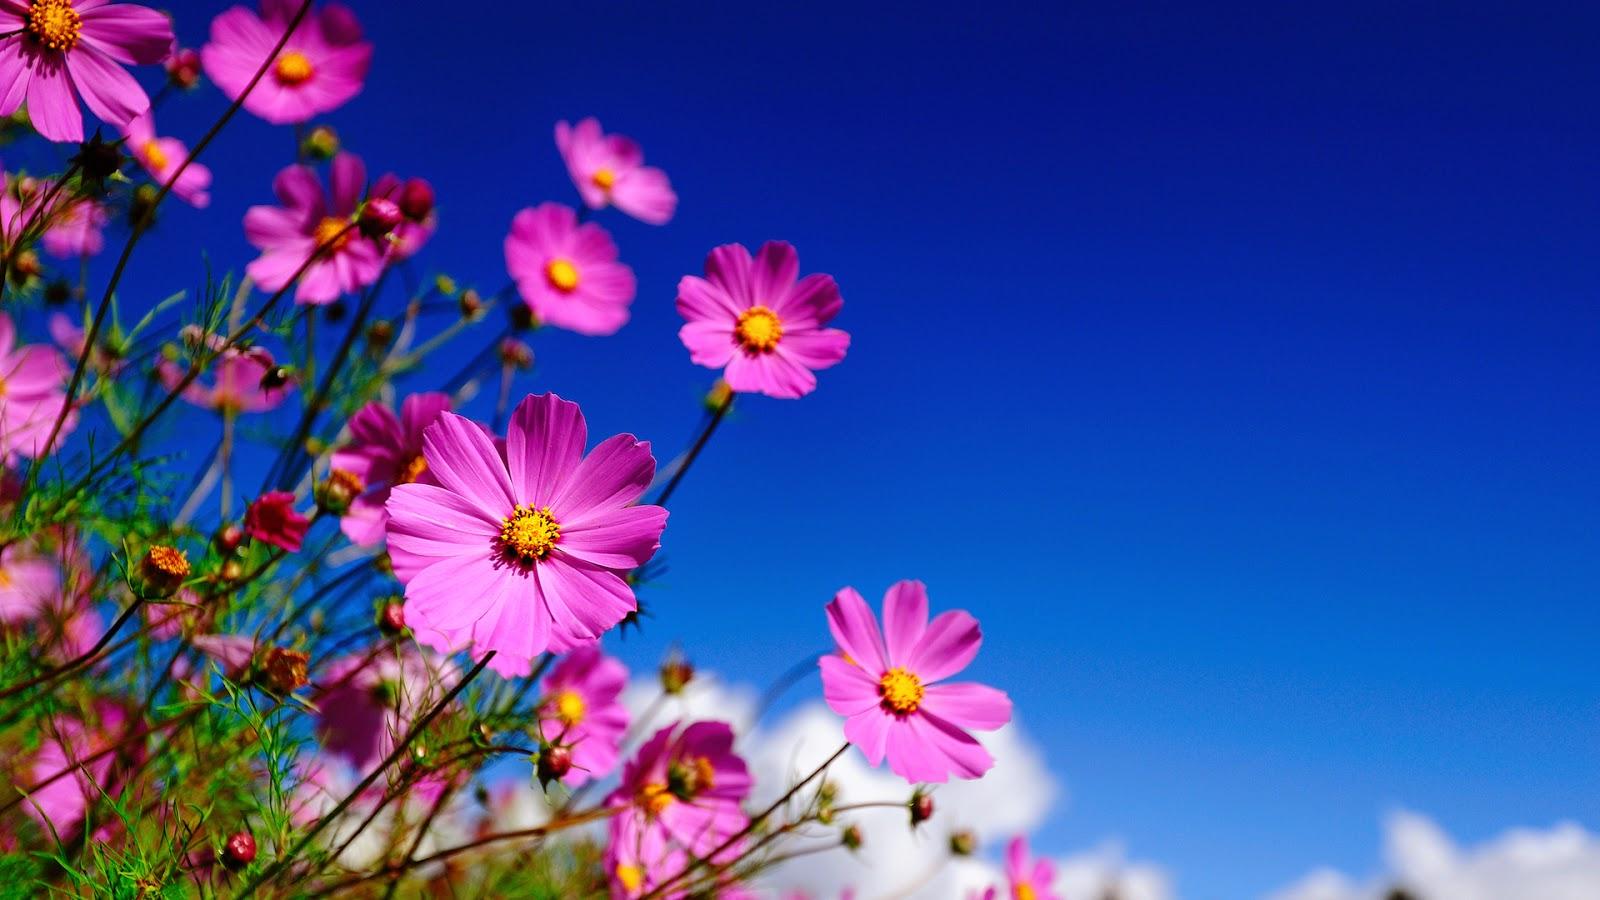 7 nice flowers wallpaper desktop background full screen